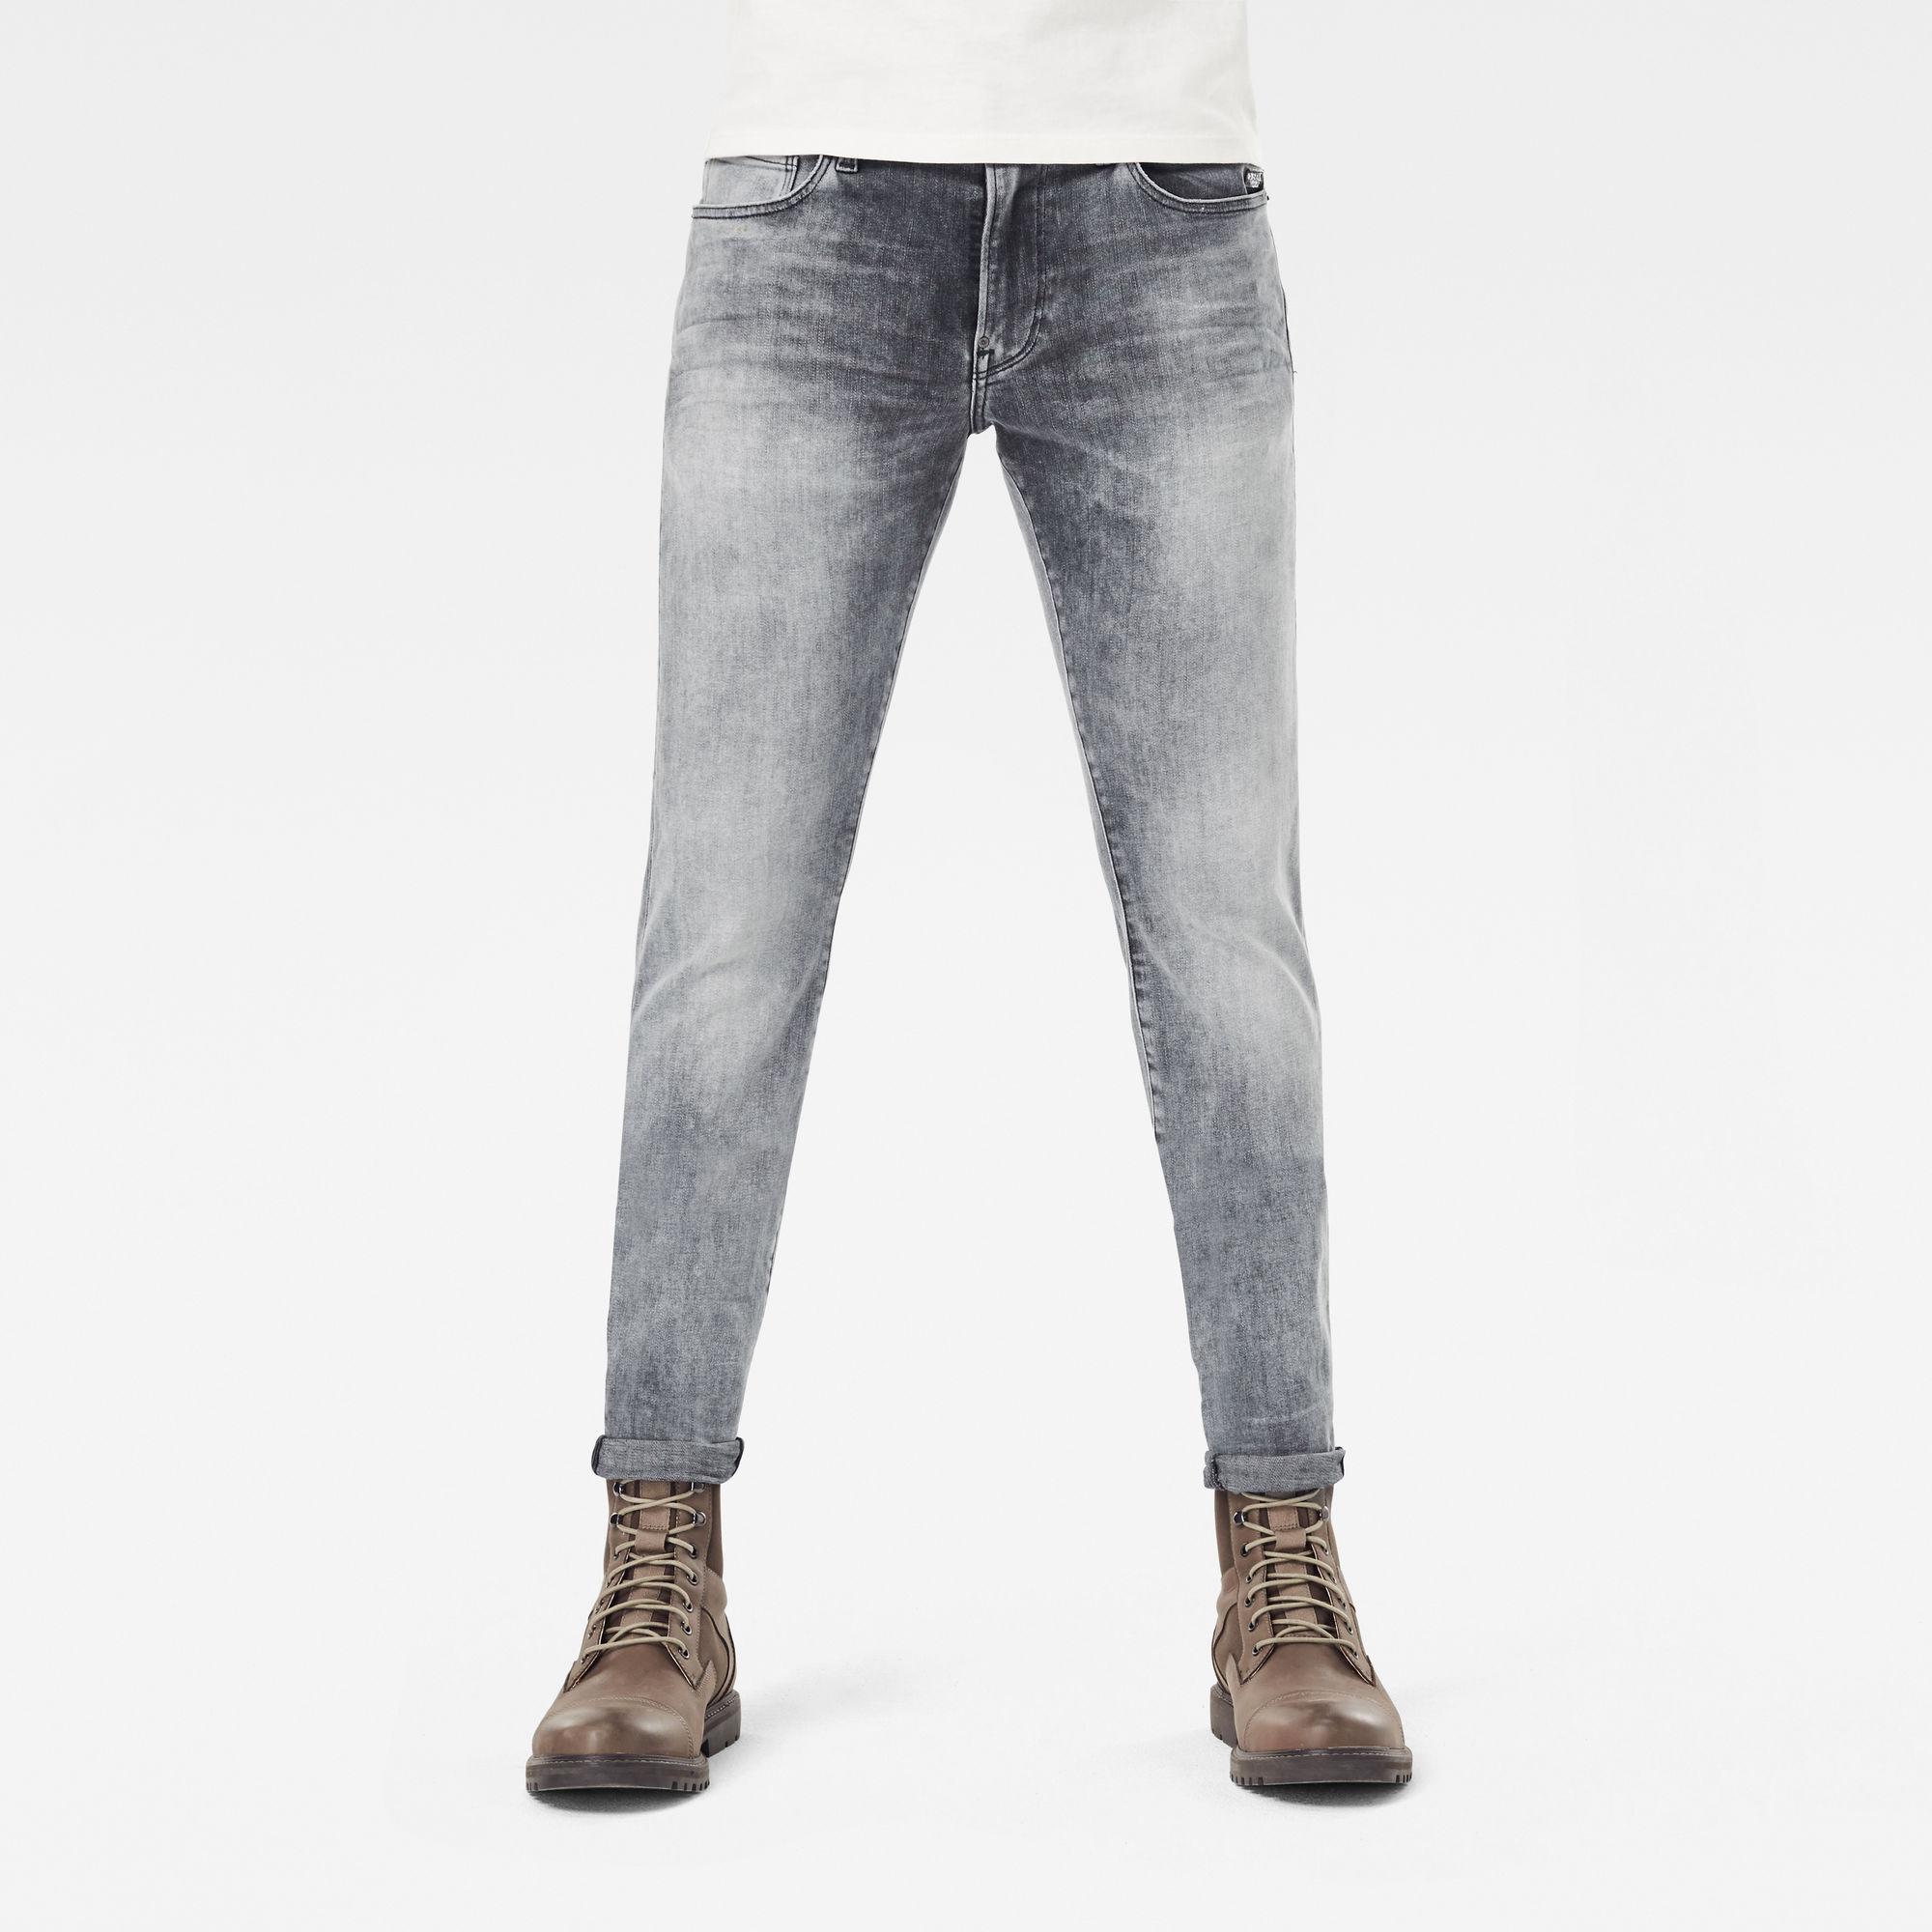 G-Star RAW Heren Revend Skinny Jeans Grijs